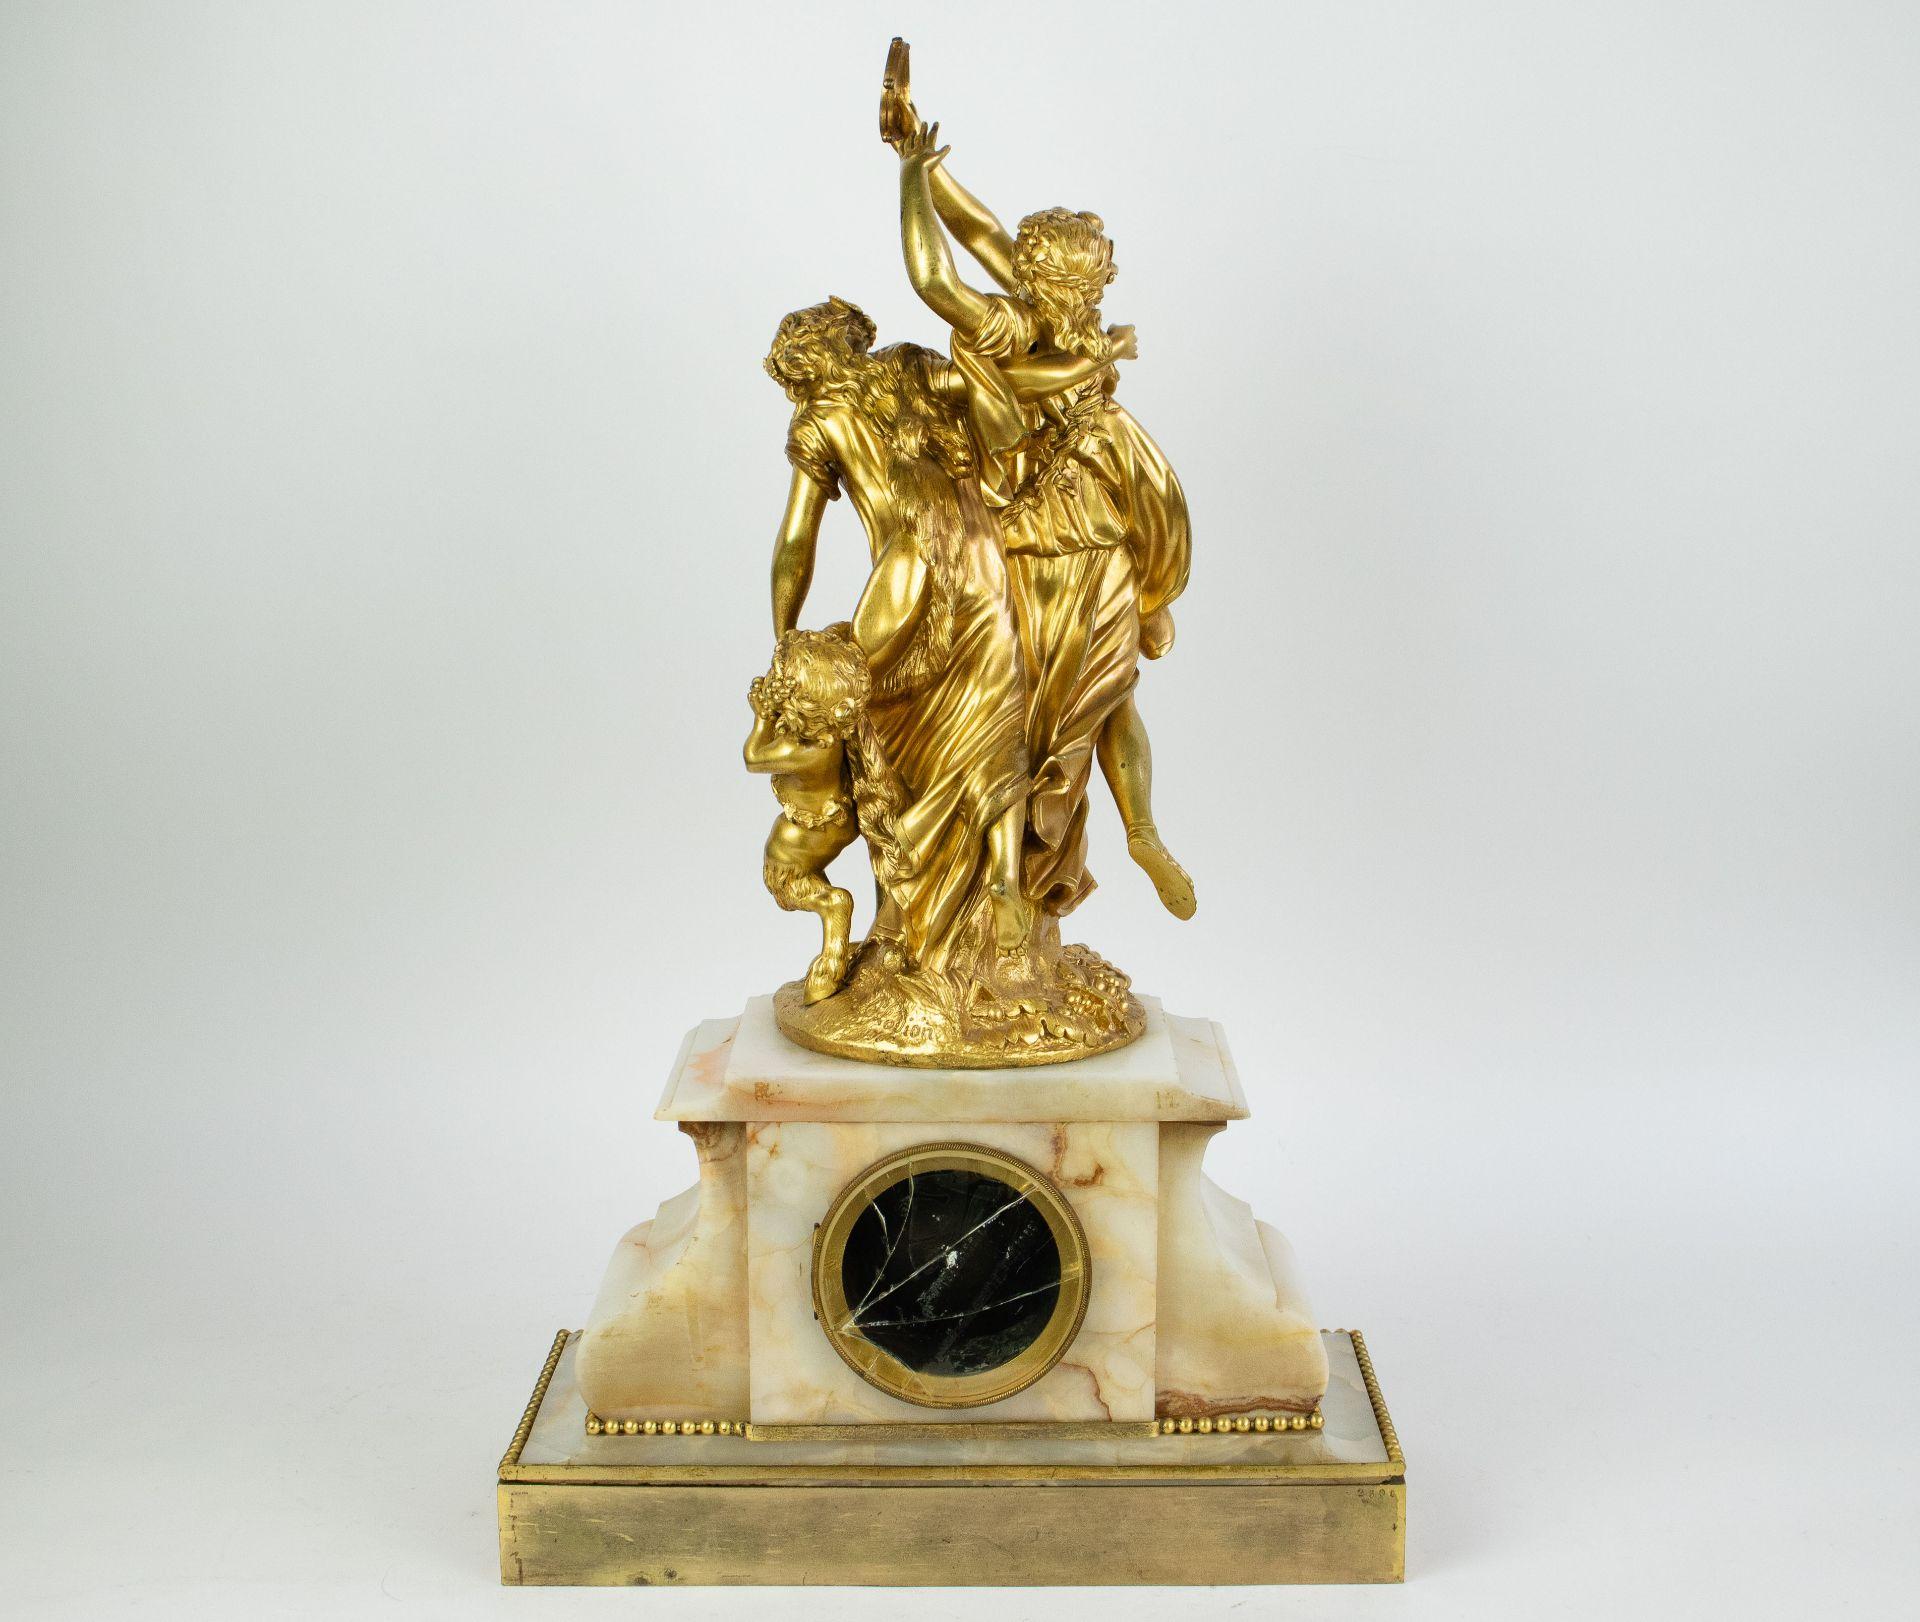 Ormulu clock with candelabra - Image 8 of 16